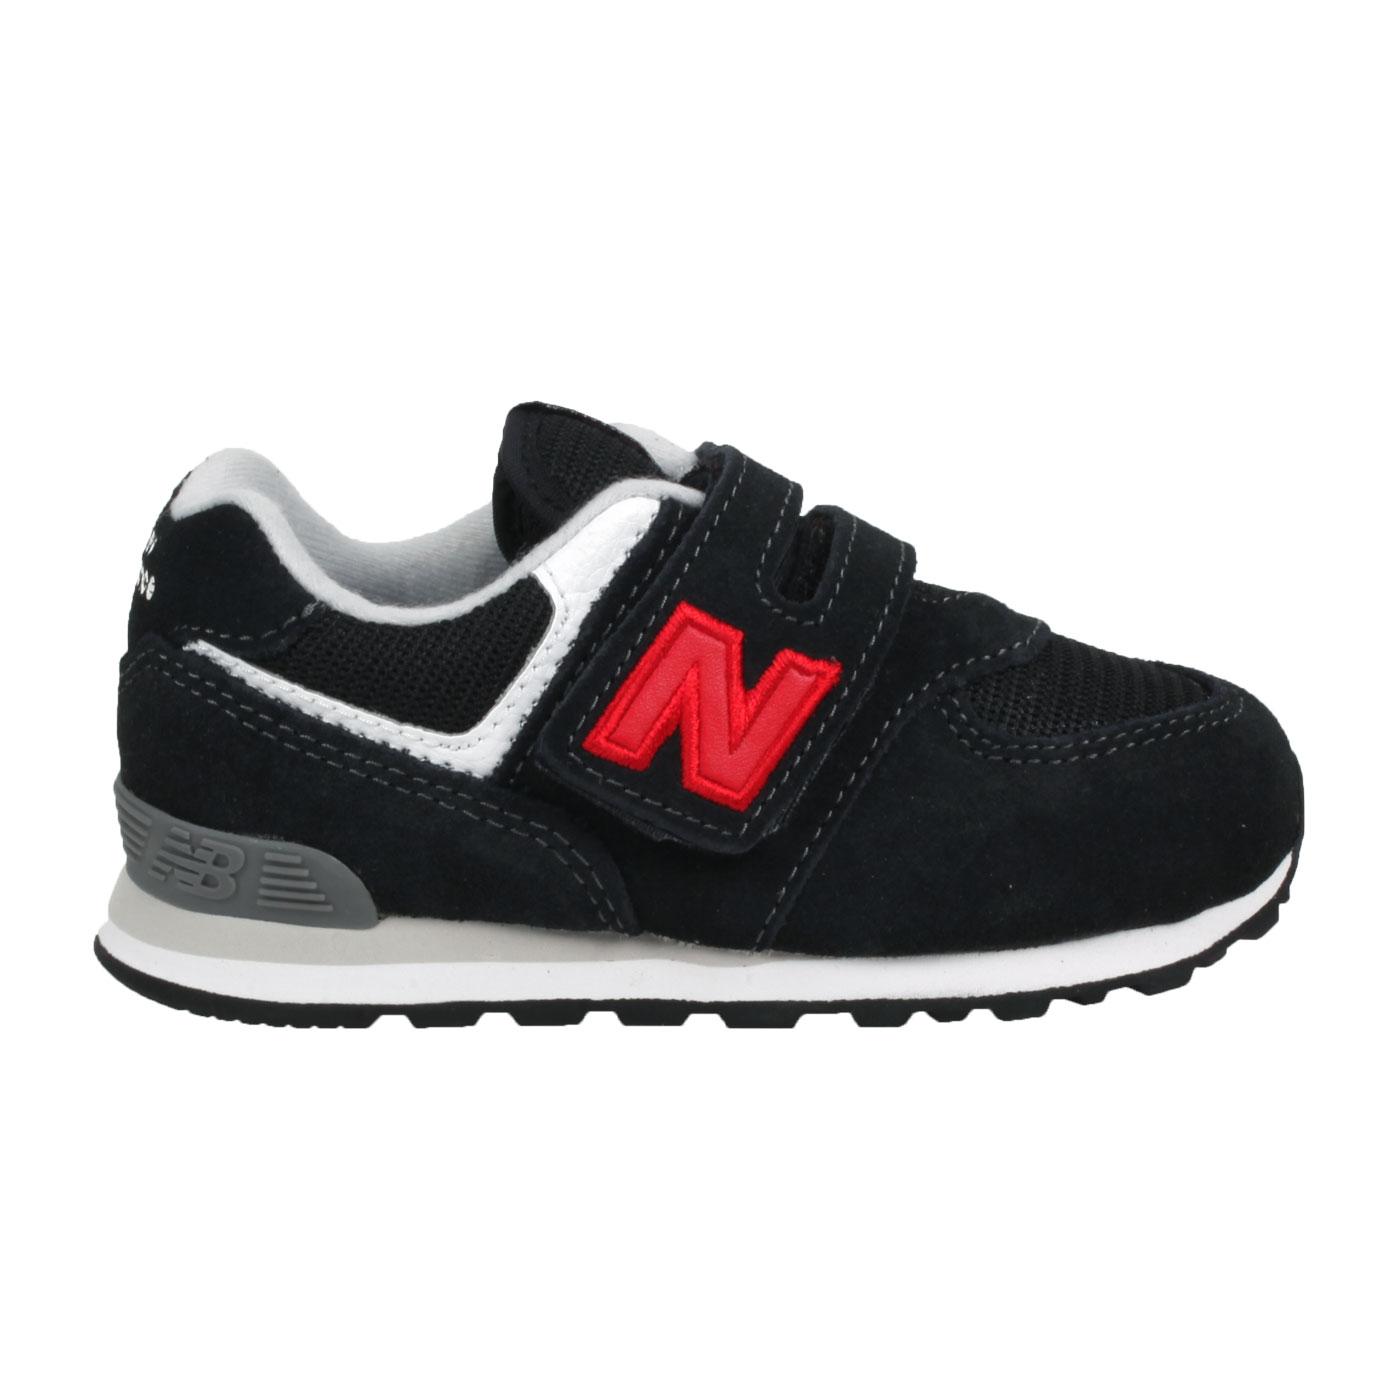 NEW BALANCE 小童休閒運動鞋-WIDE IV574HY1